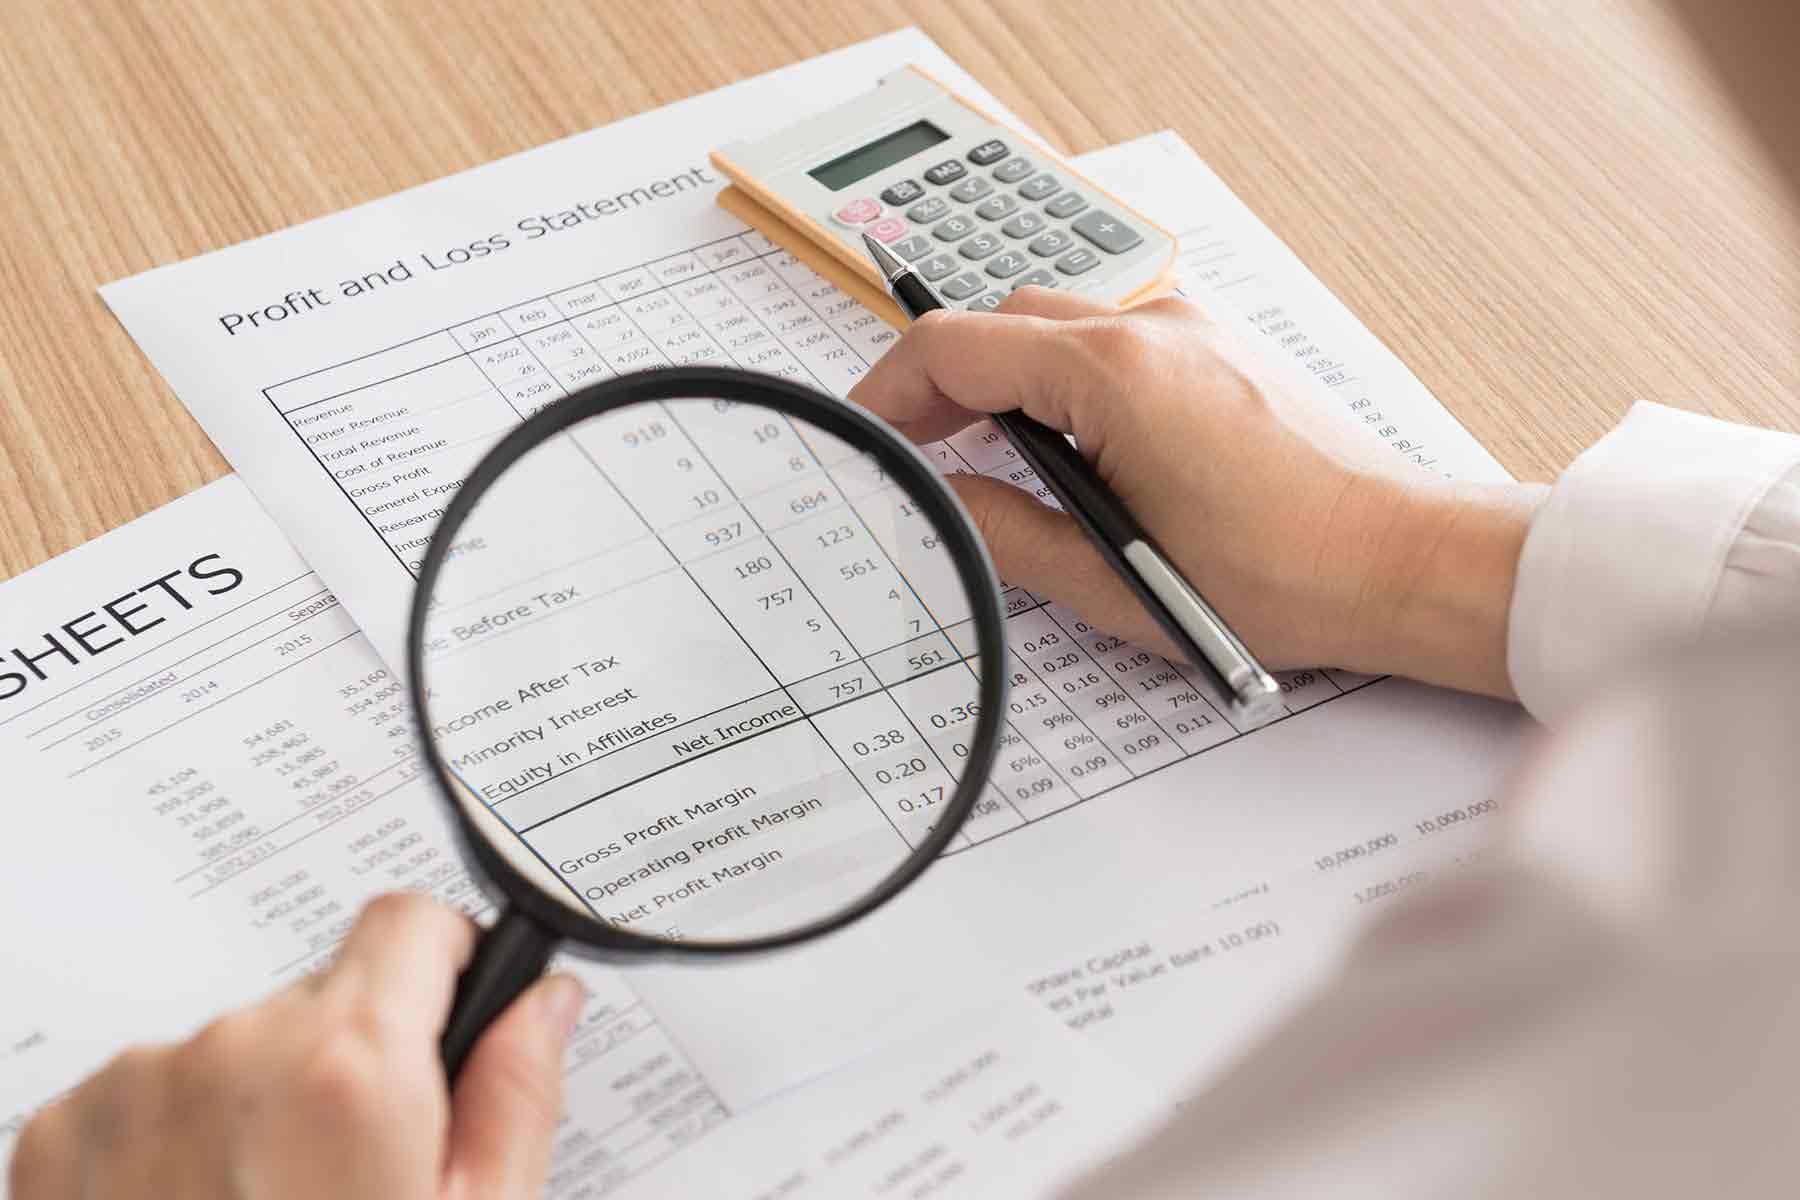 Chartered Accountants Ireland hosts major international auditing